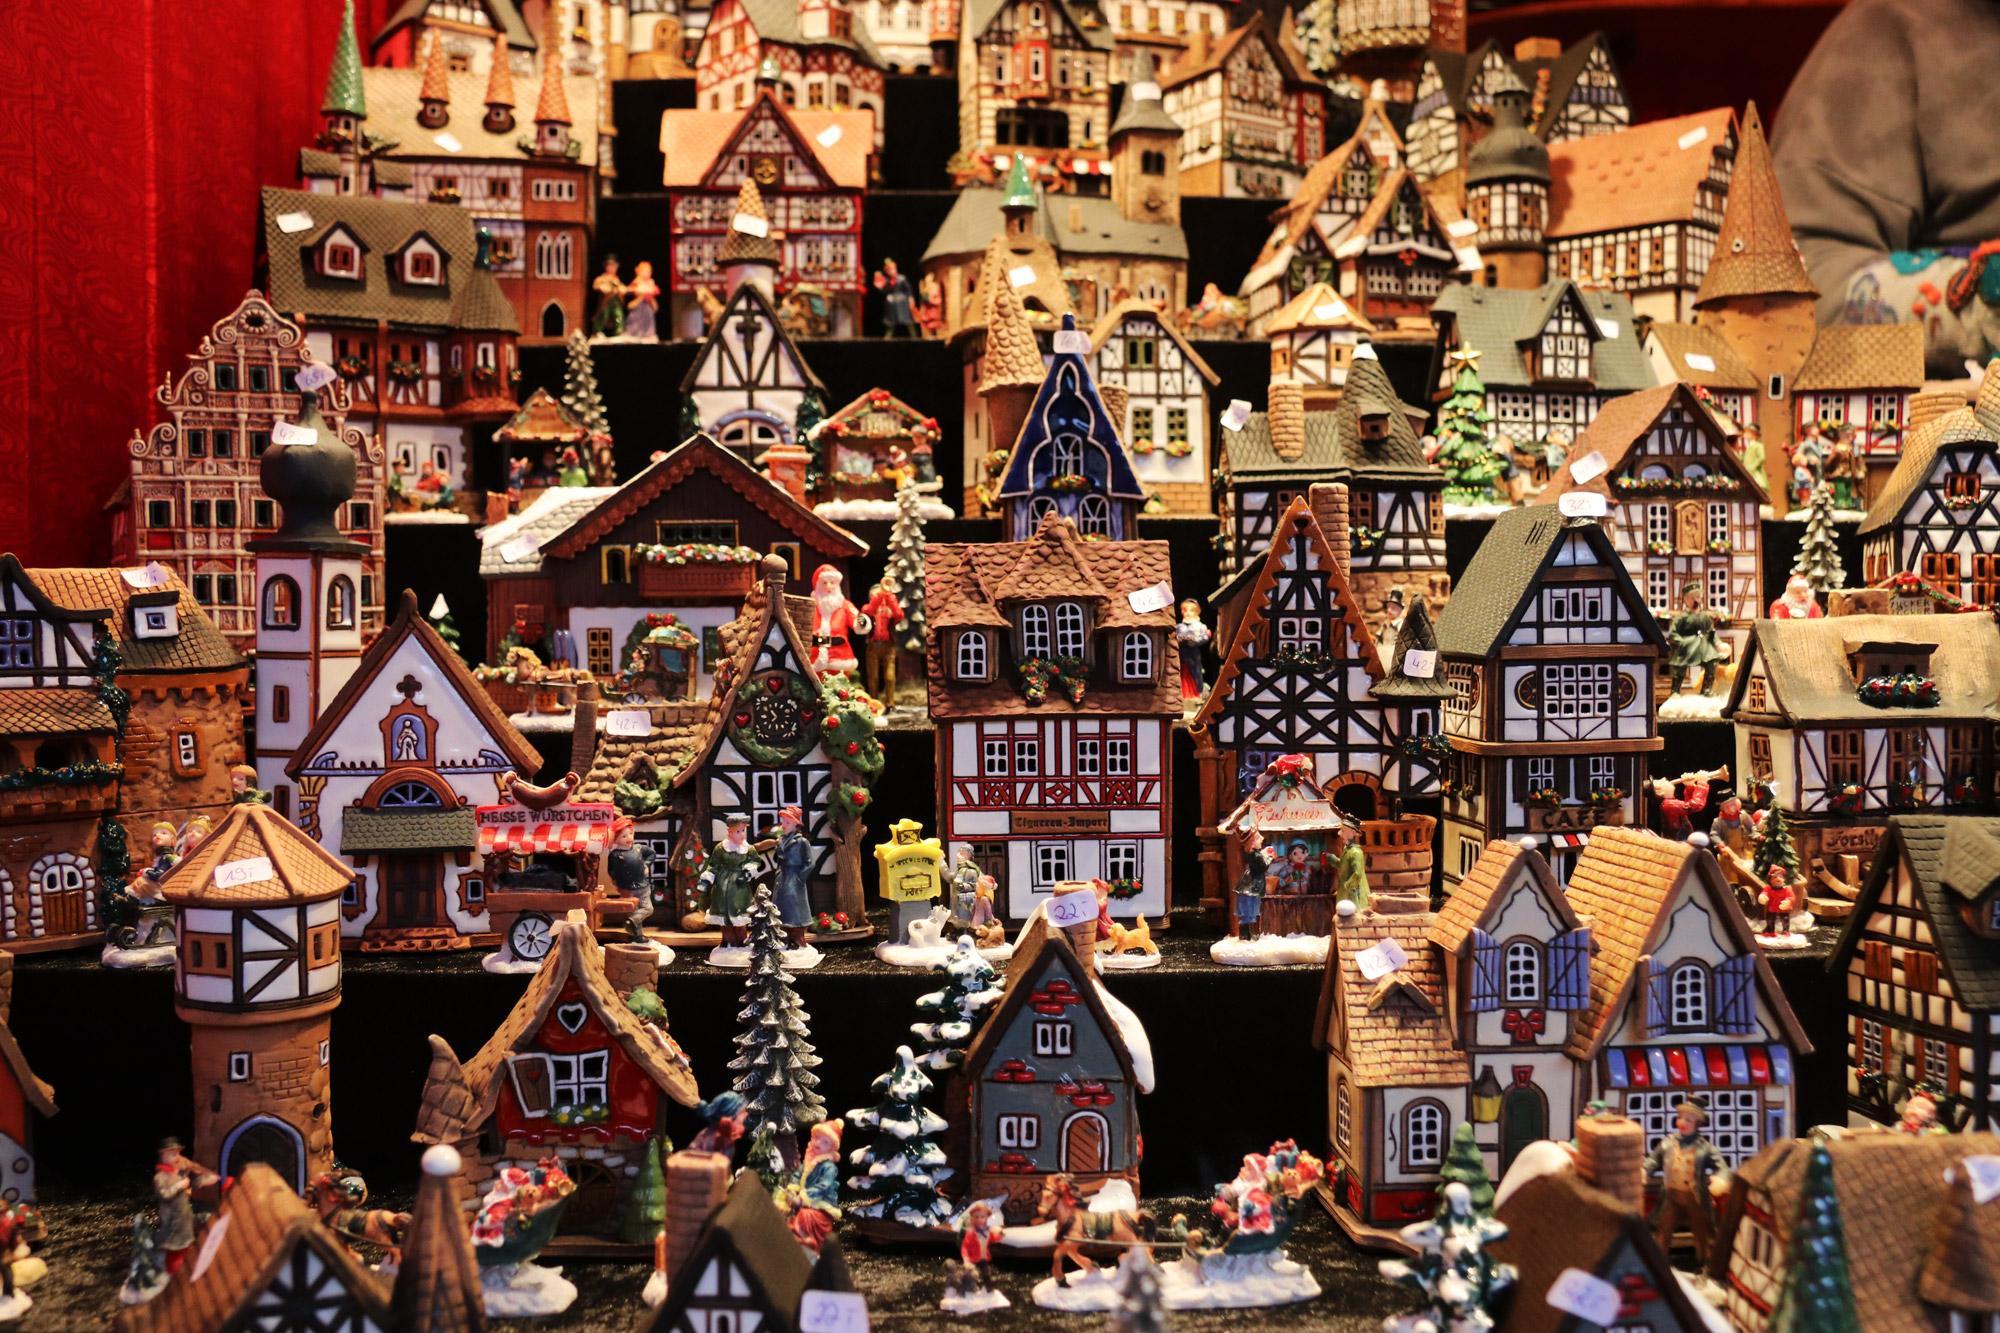 Münster kerstmarkt - Kerstspulletjes